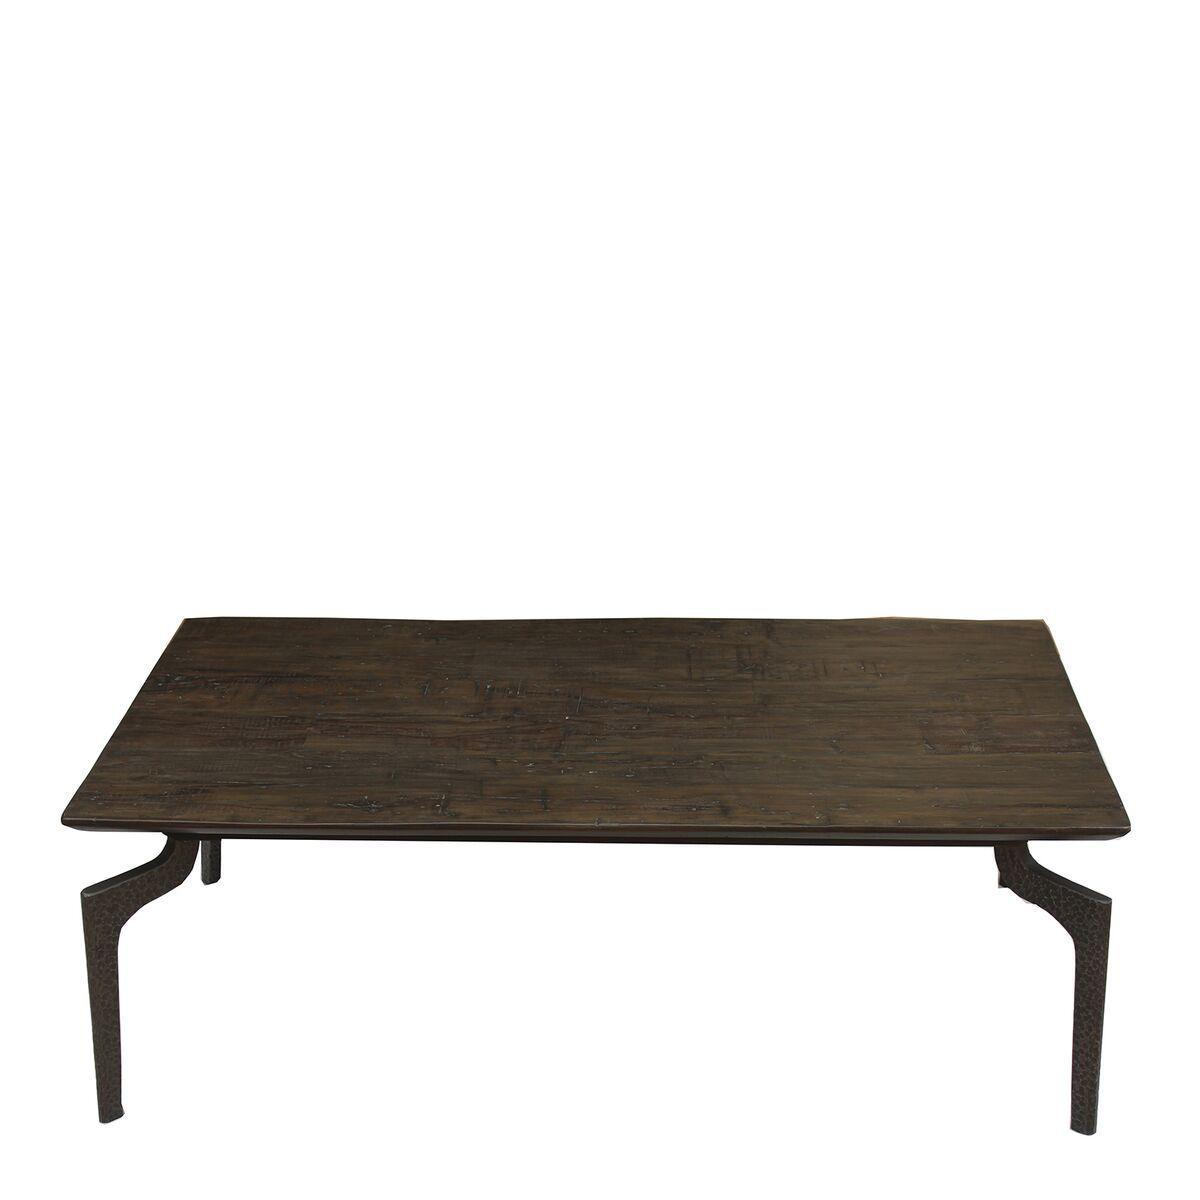 Side Table Donker Hout.Nordal Salontafel Wooden Bruin Hout 40 X 120 X 70 Huis